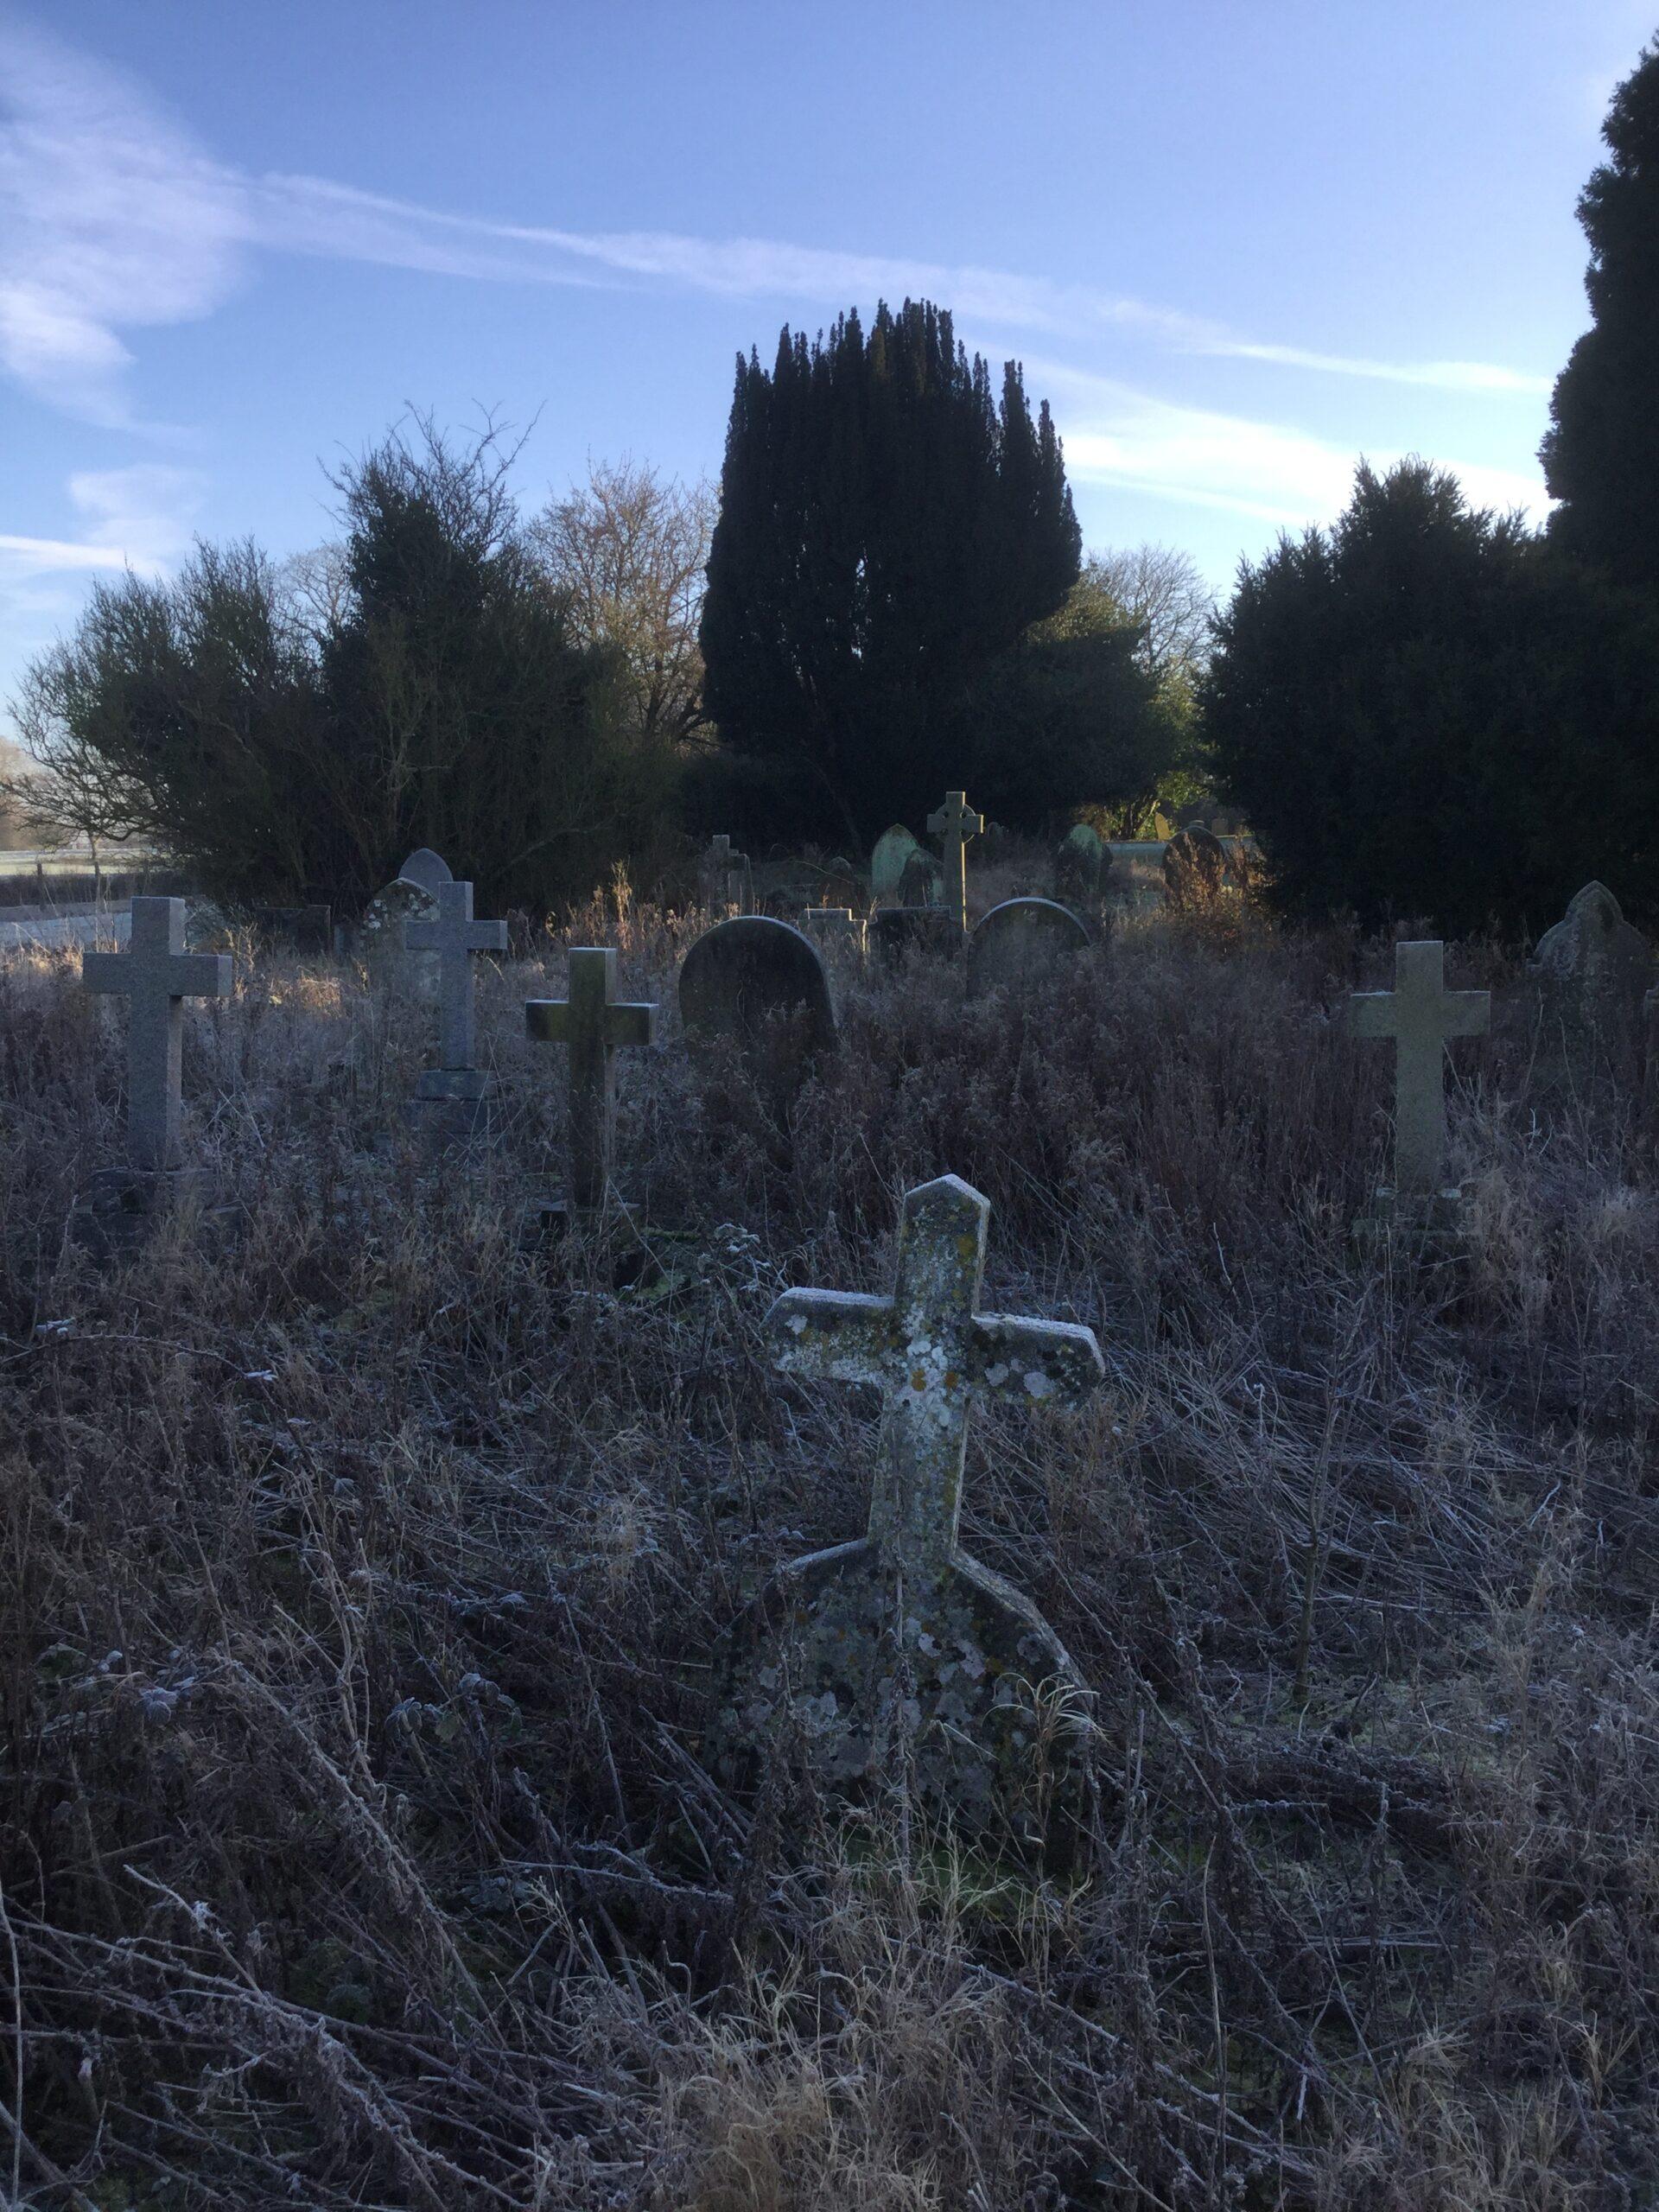 Older gravestones